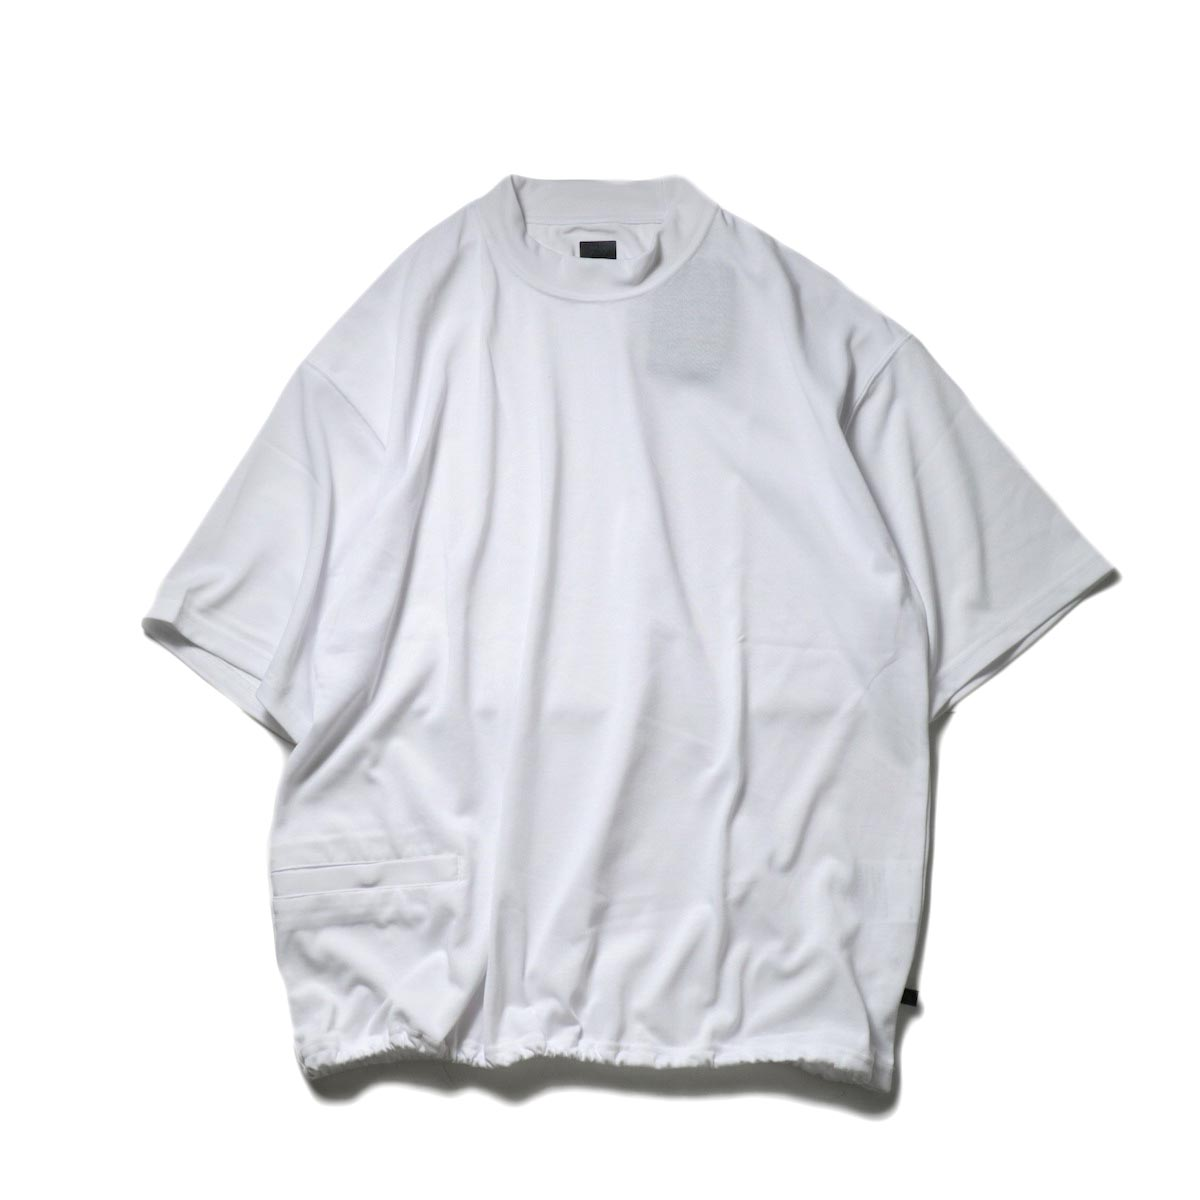 DAIWA PIER39 / Tech 1P Hi-Crew NeckT-Shirts (White)